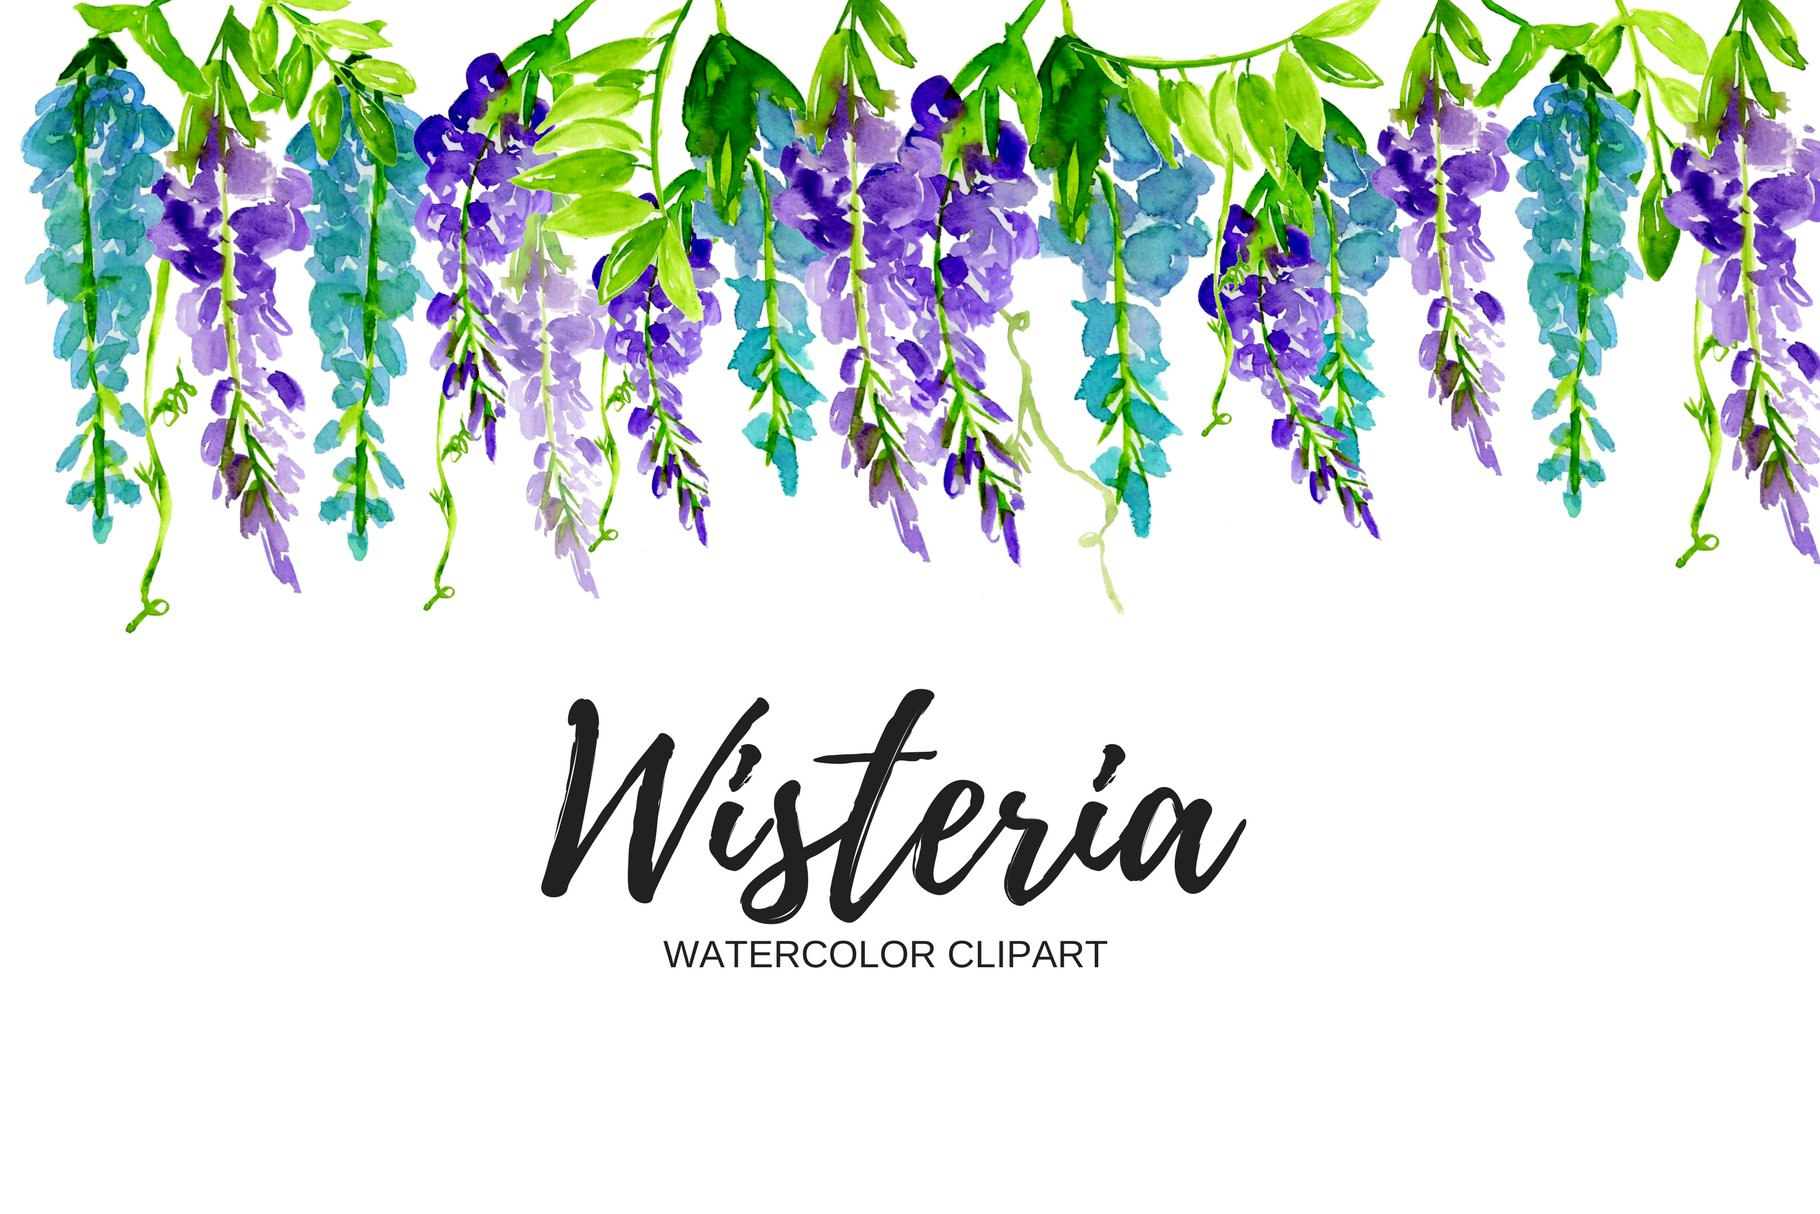 be2b7a8b6d5 Watercolor Wisteria Clipart ~ Illustrations ~ Creative Market